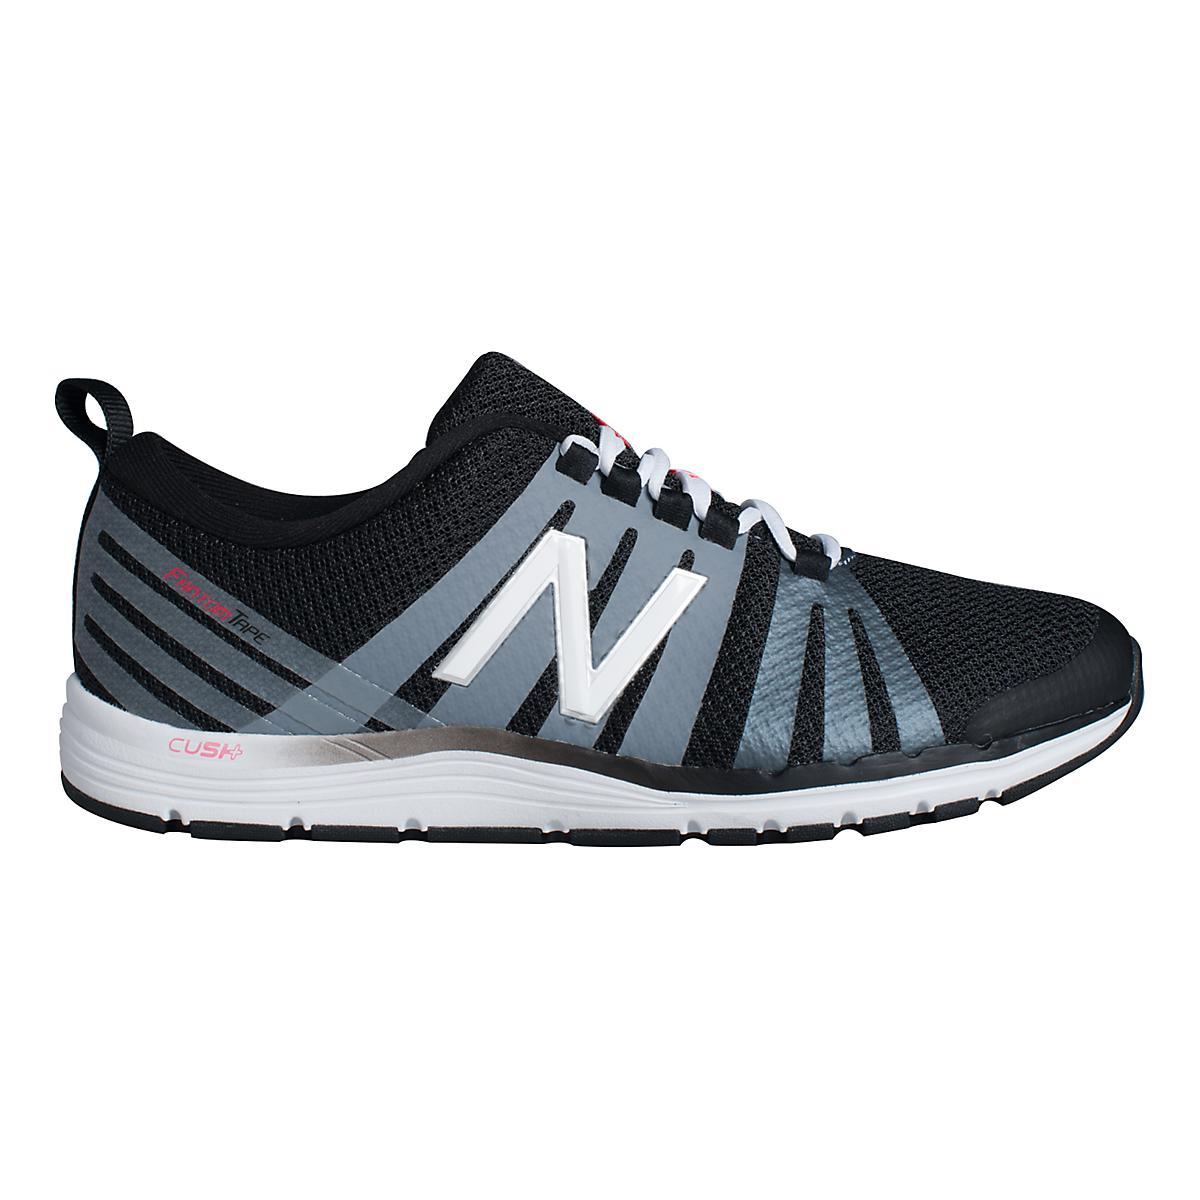 Womens New Balance 811 Cross Training Shoe at Road Runner Sports